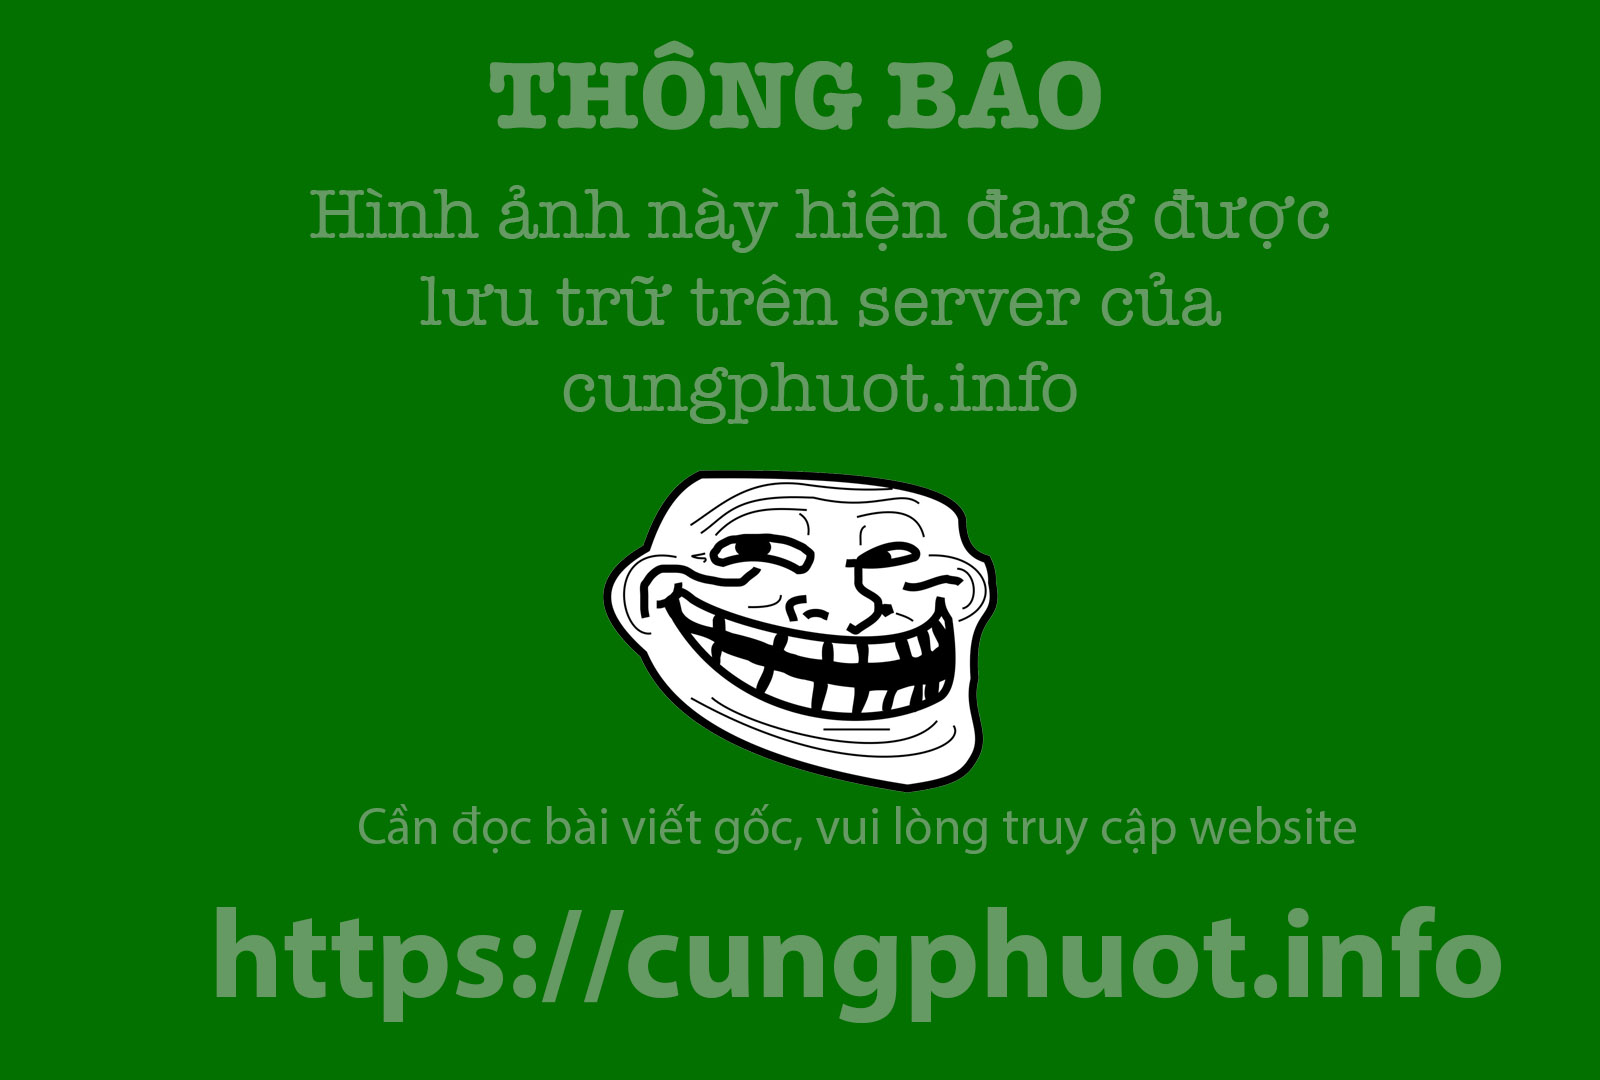 Ve dep thanh cao, huyen bi cua Dan vien Chau Son hinh anh 6